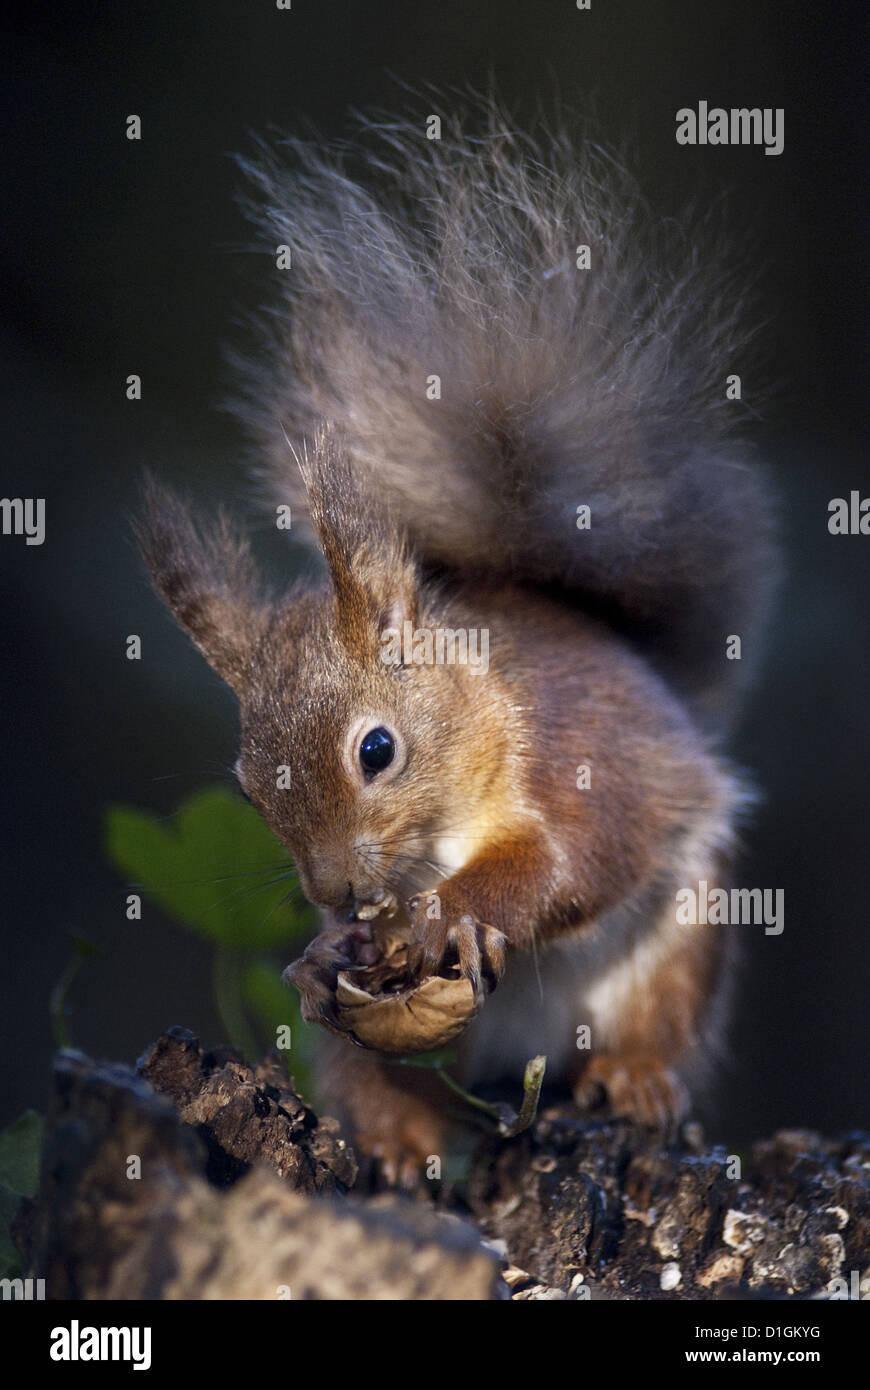 Red squirrel (Sciurus vulgaris) eating nuts in a wood, United Kingdom, Europe - Stock Image